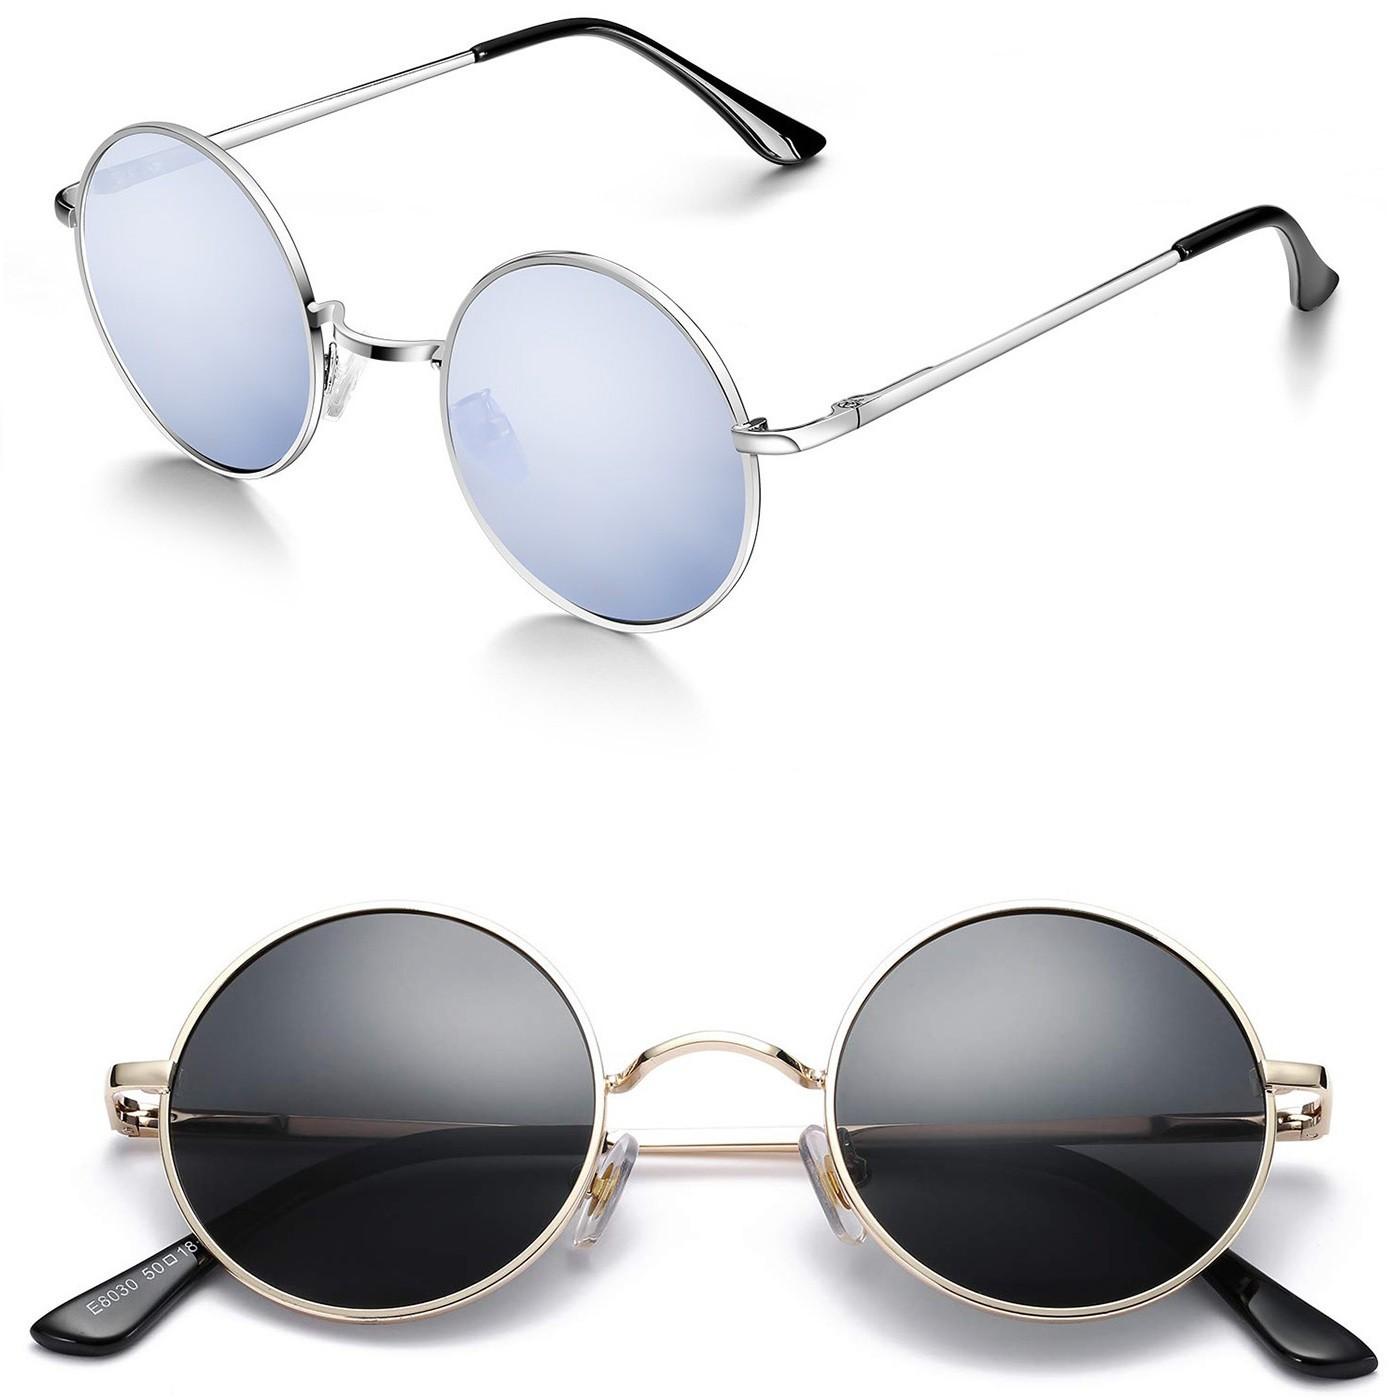 Occhiali da sole ROTONDI Hippie - stile TEASHADES John Lennon - Metallo Leggero VINTAGE uomo donna - Colore : GOLD / Marrone